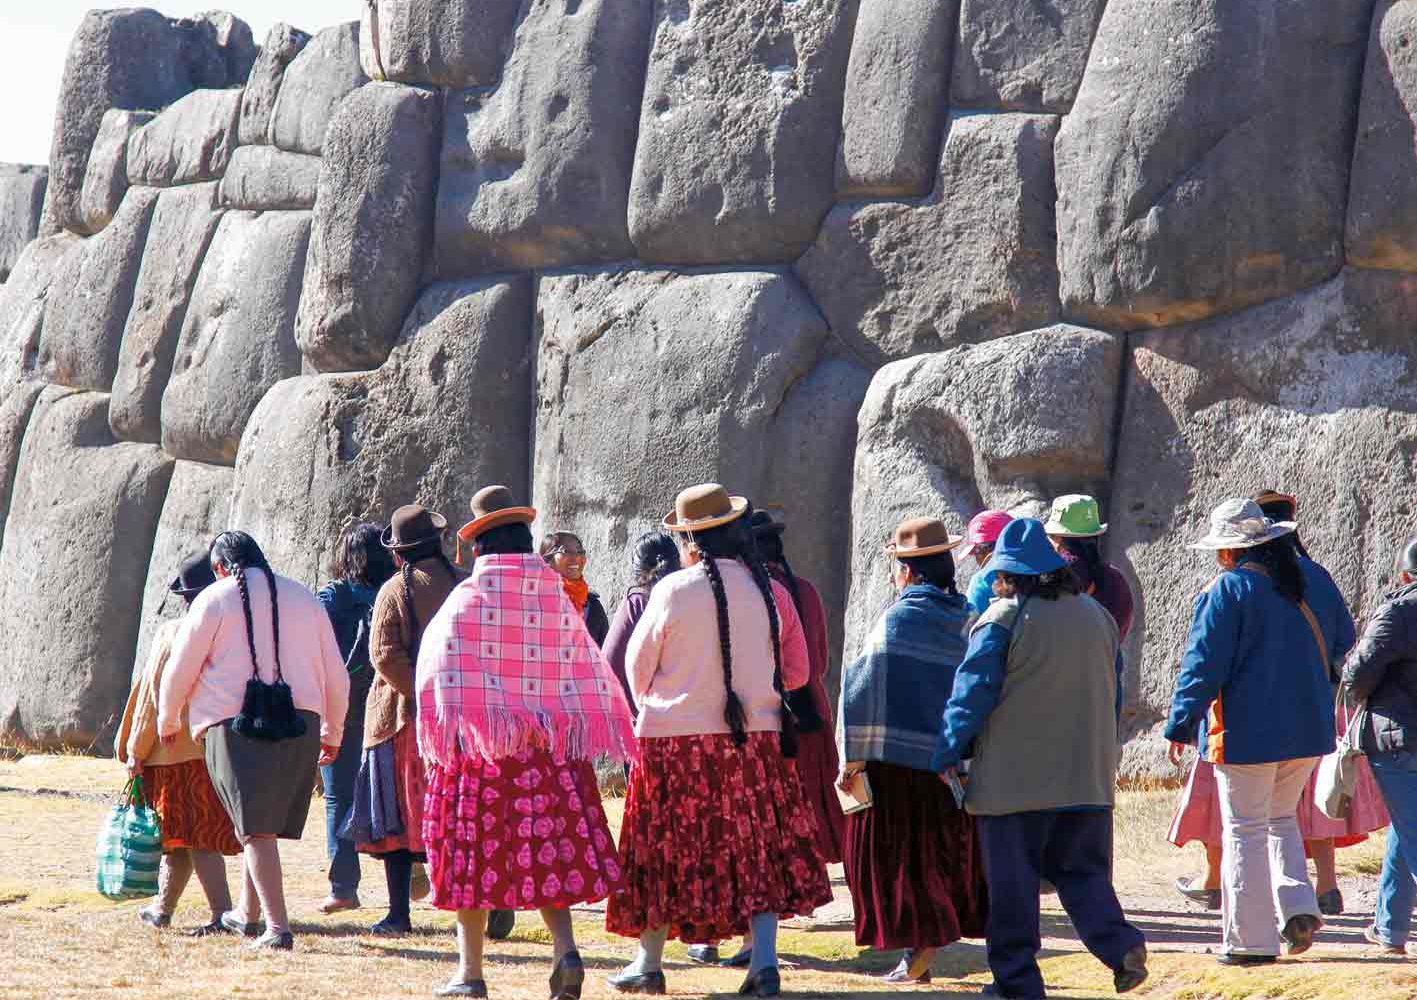 Inka-Stätte Saqsayhuamán